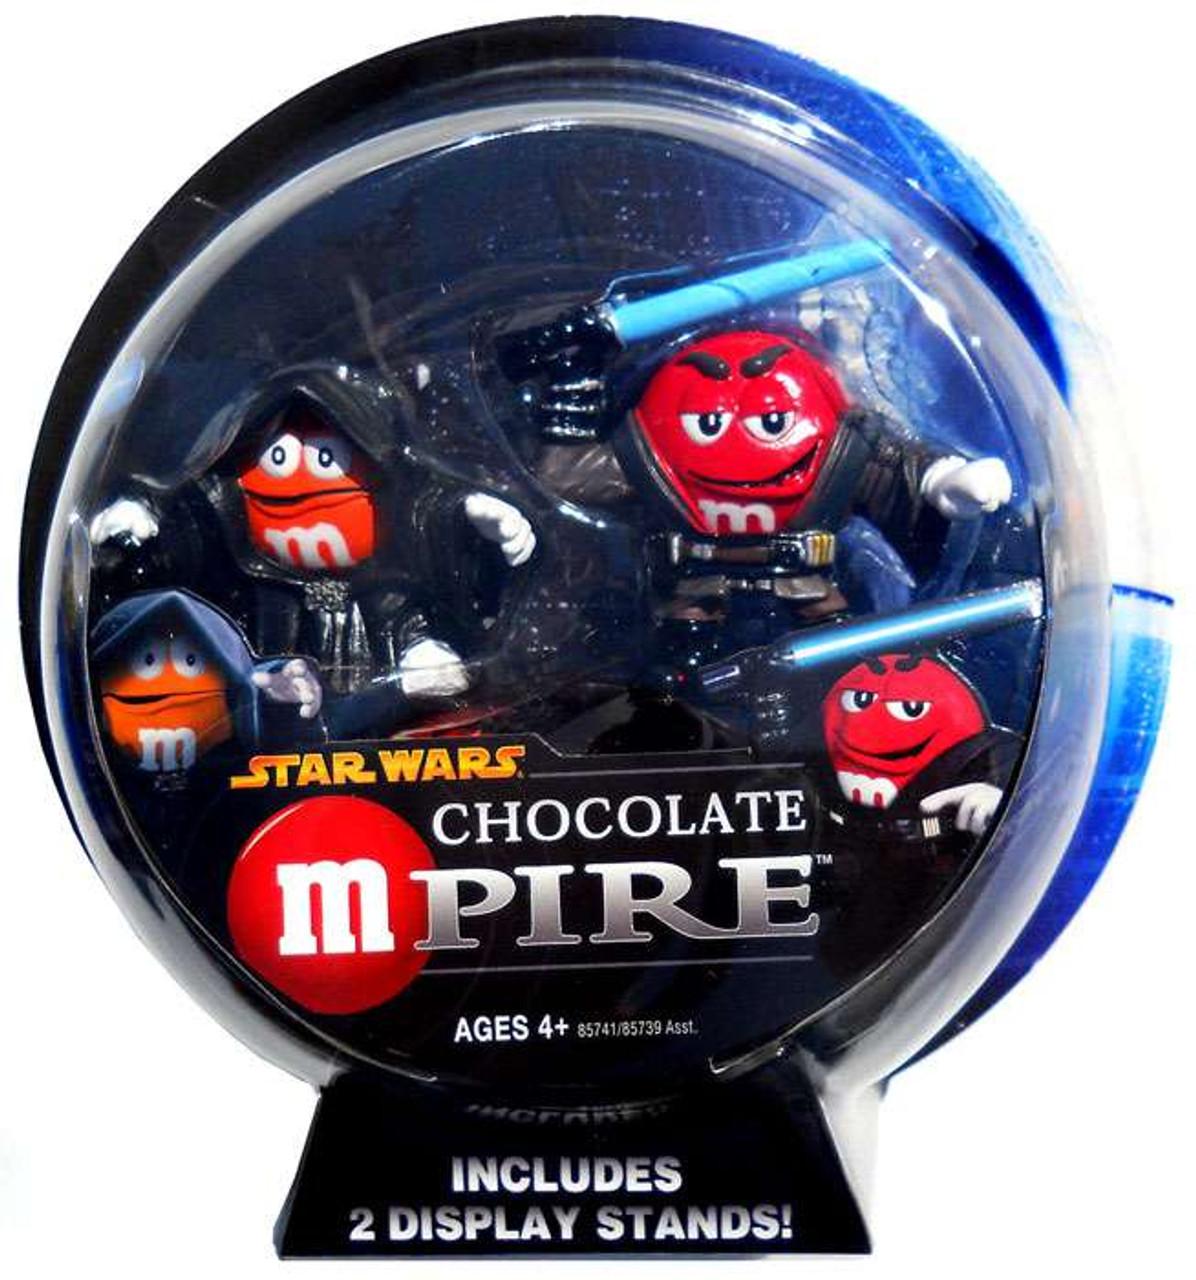 Star Wars M&Ms Chocolate Mpire Emperor Palpatine & Anakin Skywalker Action Figure 2-Pack